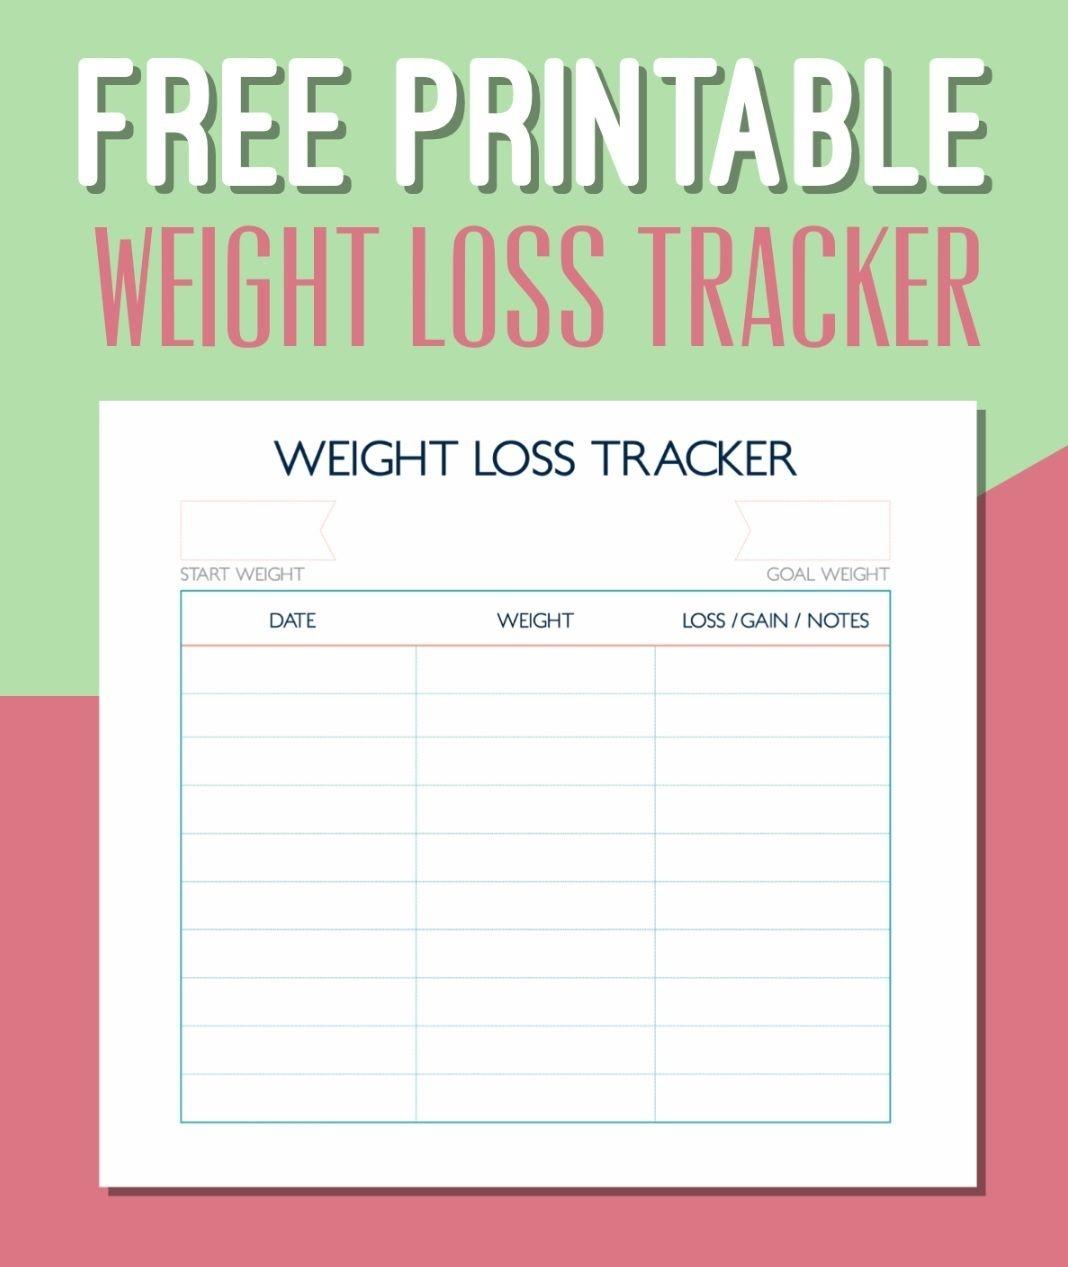 Free Printable Weight Loss Tracker Calendar 2018 Calendar 2018